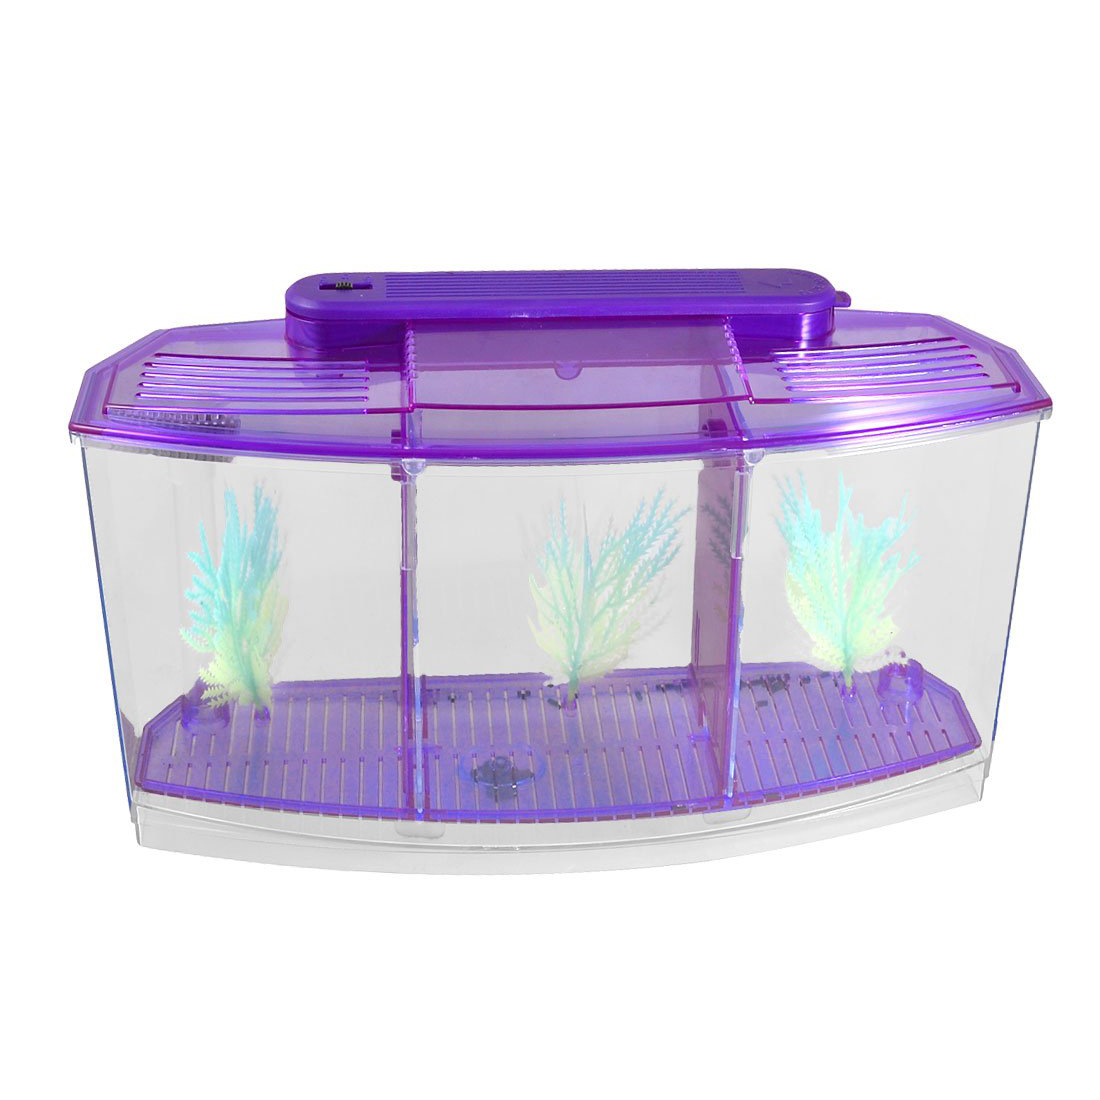 Fish aquarium india price - Bestselling Clear Plastic Battery Powered Led Lamp Mini Desktop Fish Aquarium China Mainland